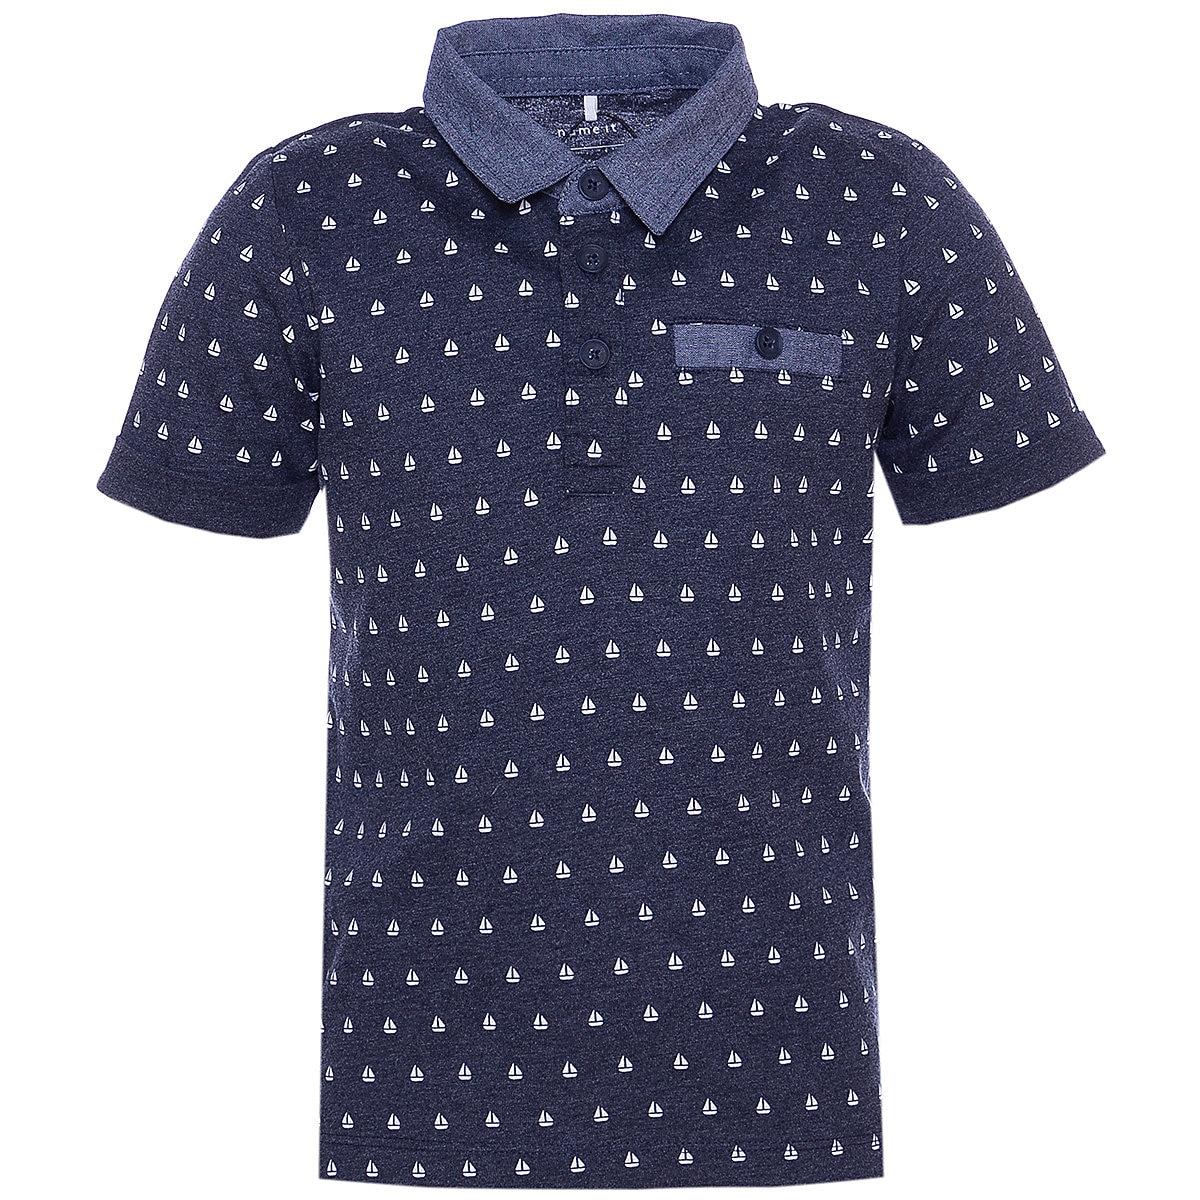 NAME IT Polo Shirts 10623662 Children Clothing T-shirt Shirt The Print For Boys